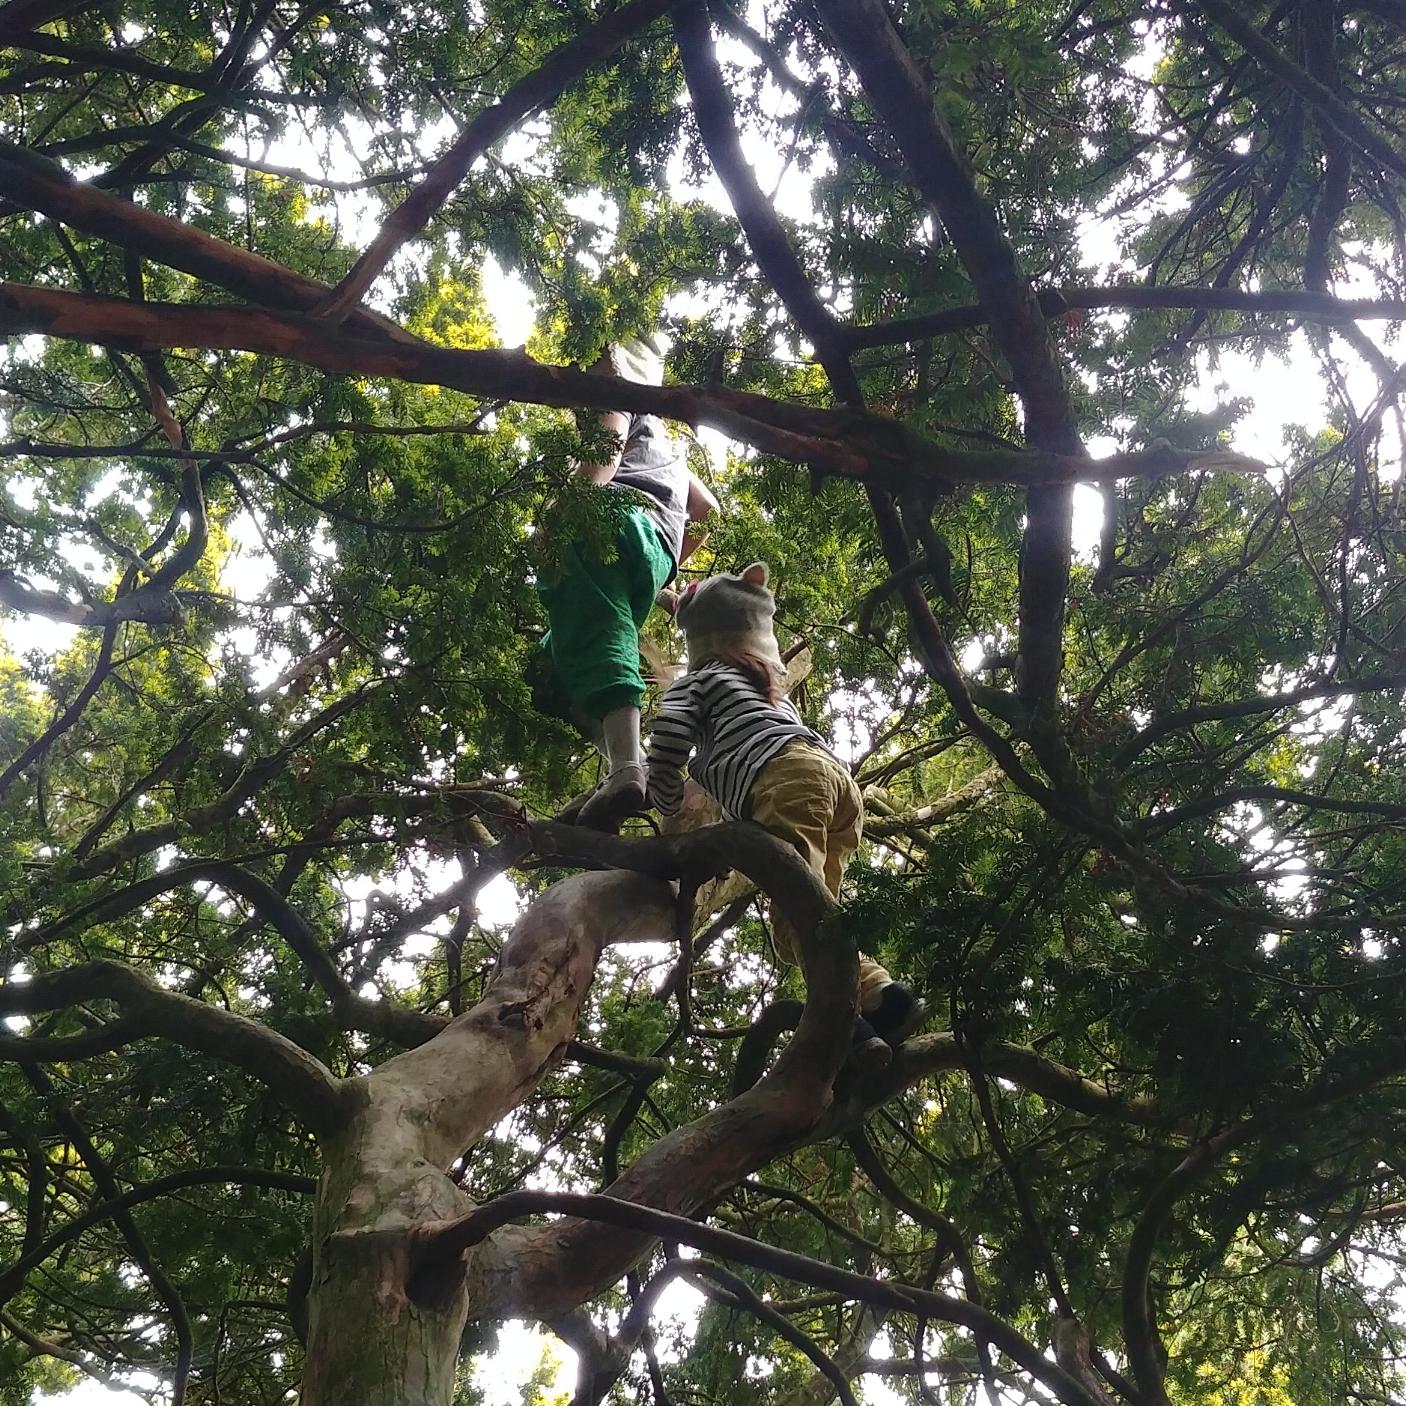 A couple of little tree-climbing monkeys.